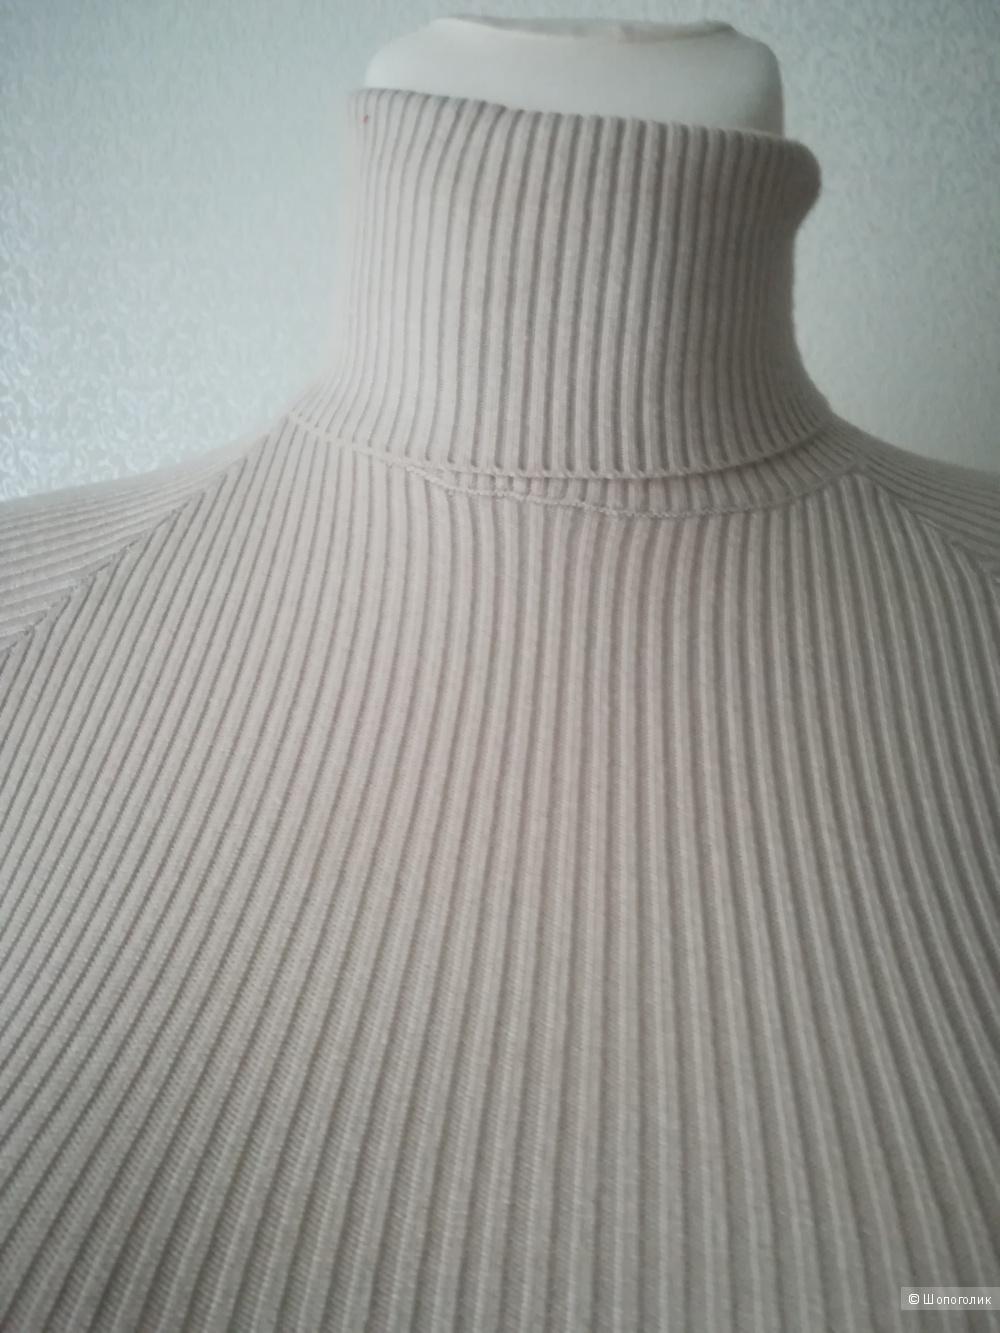 Водолазка Gina tricot, размер xs/s